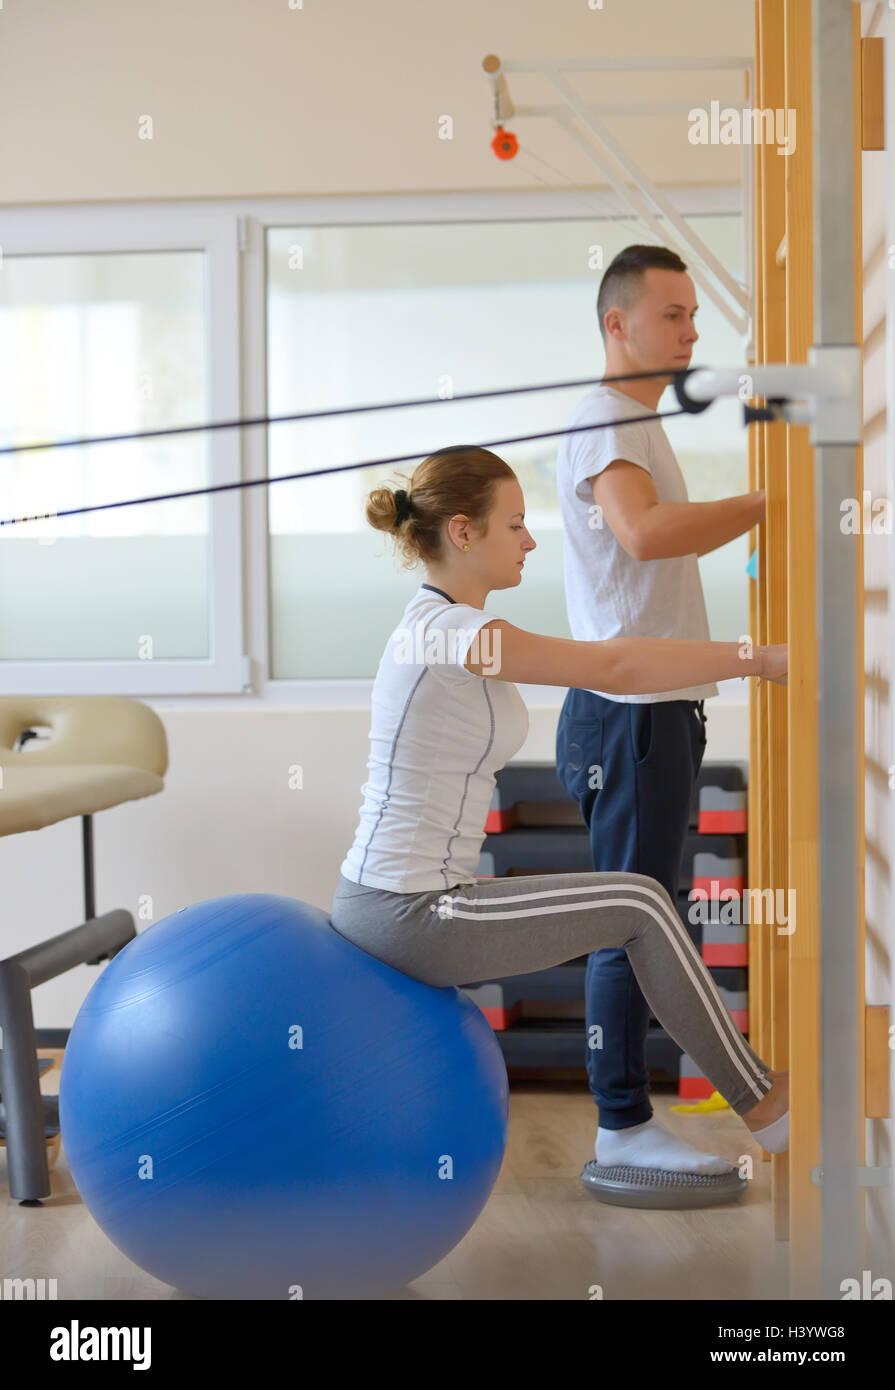 elongation treatment of low back pains - Stock Image